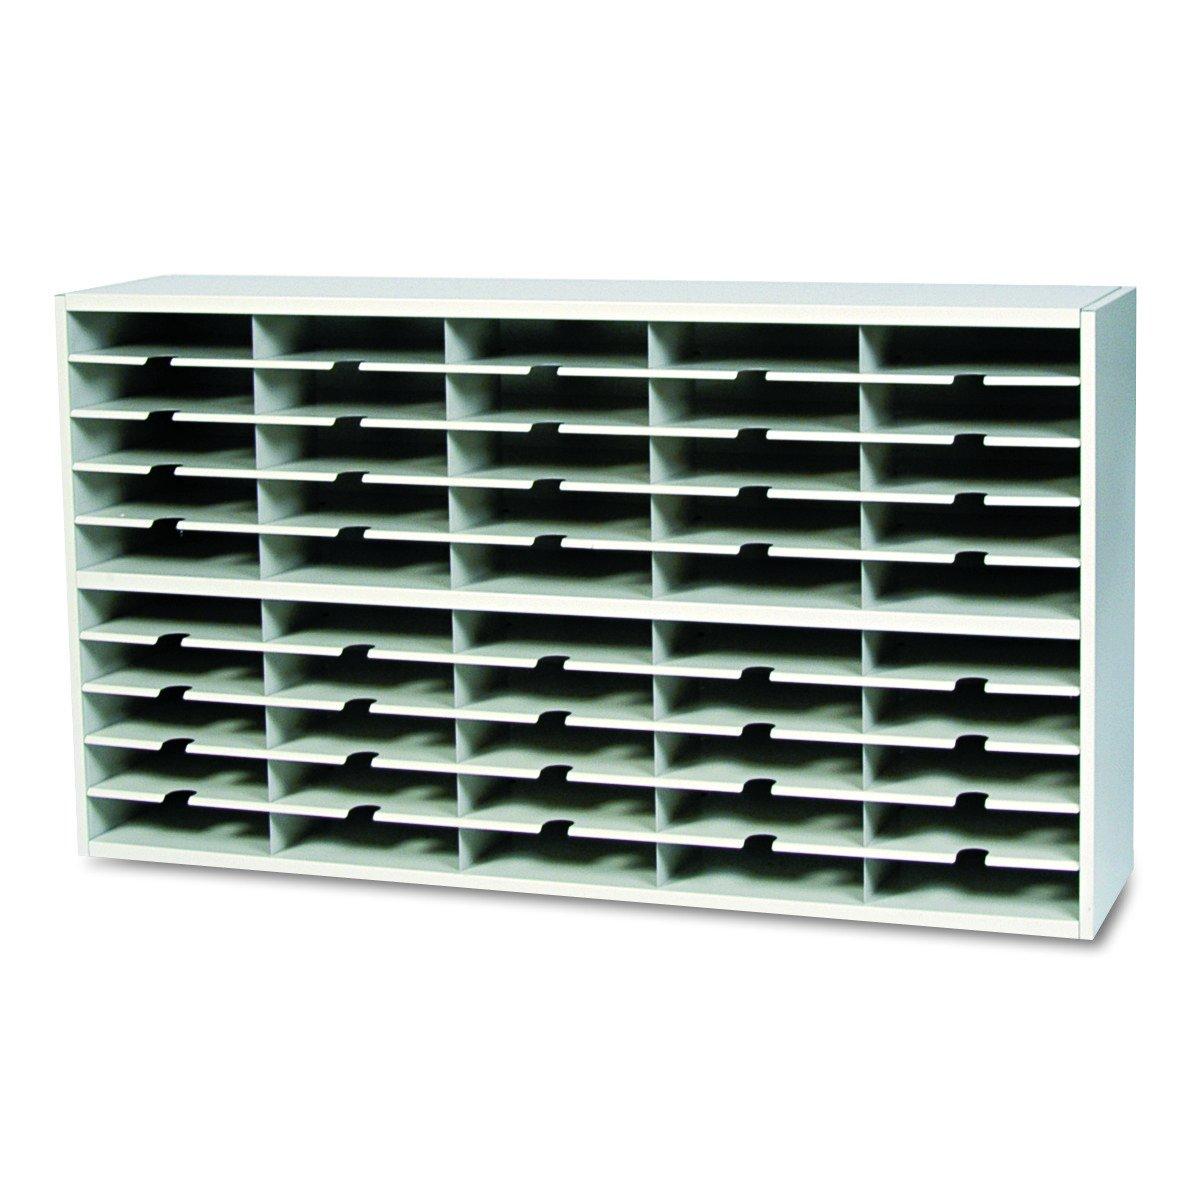 Mayline SR6033PG Mailroom system 2 tier sorter w/o riser, 40 pockets, 60w x 13 1/4d x 33 1/4h